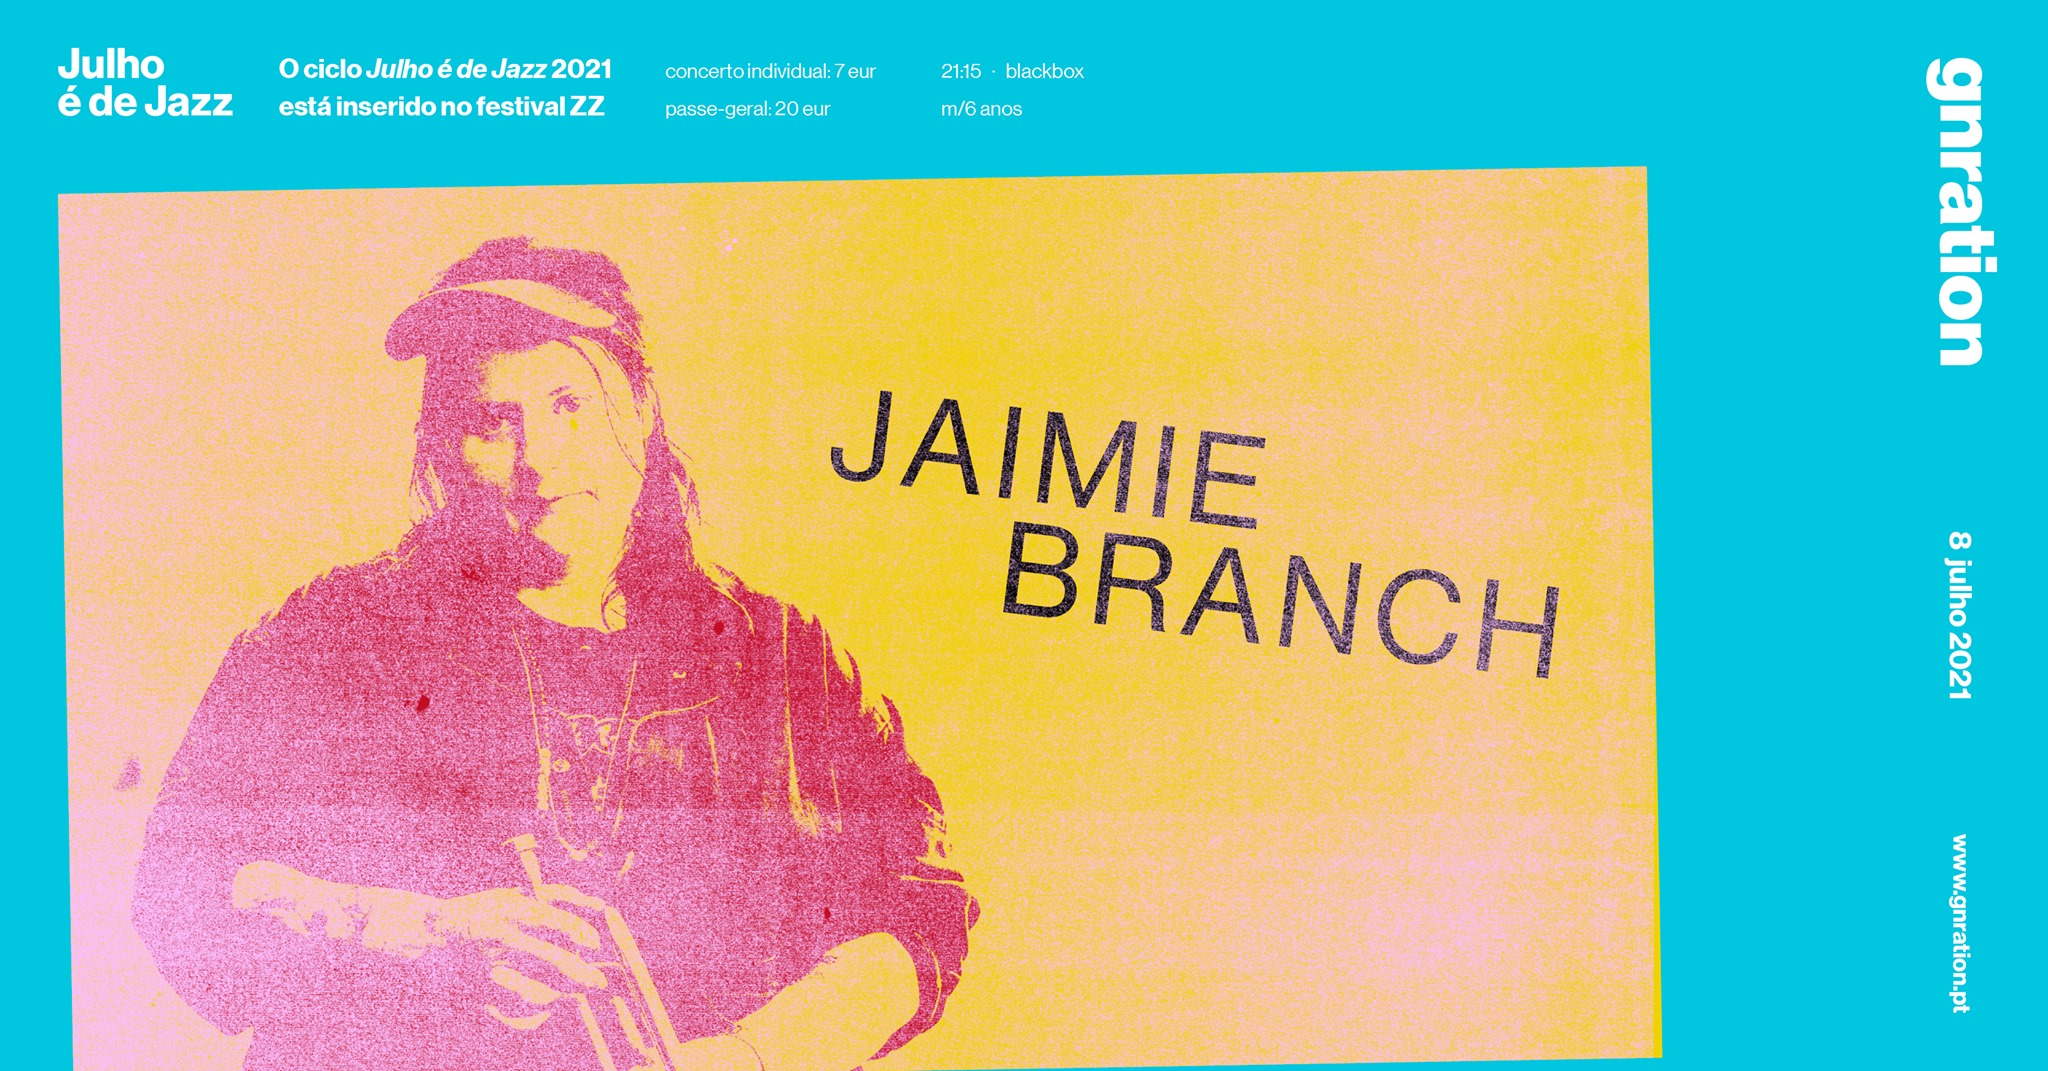 Julho é de Jazz: Jaimie Branch | gnration